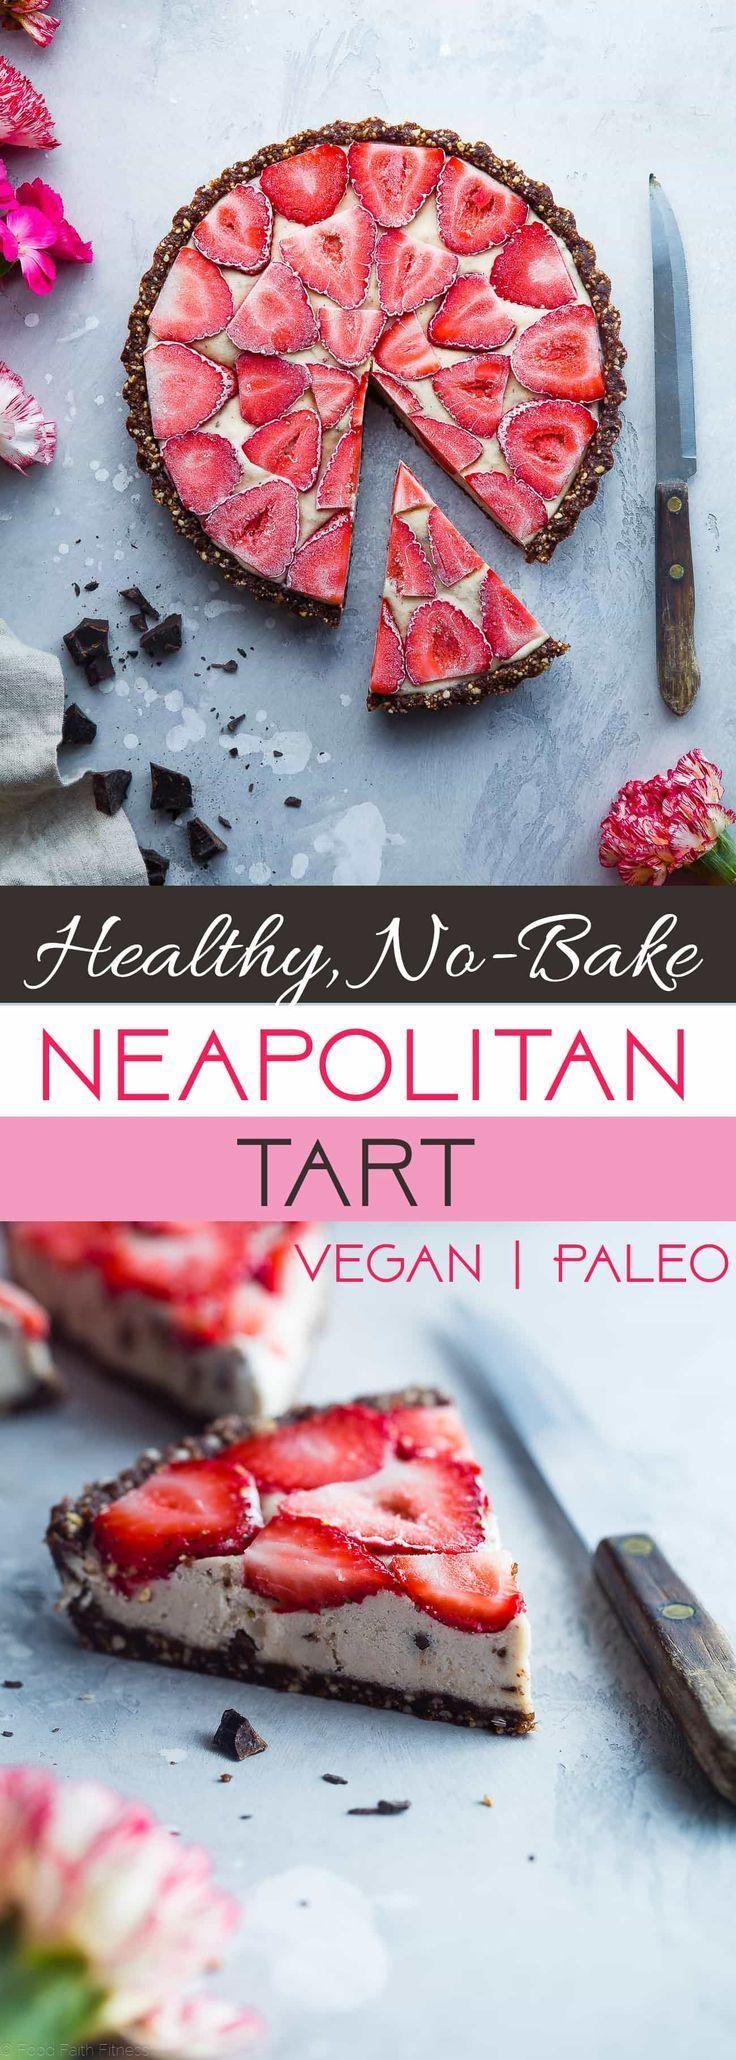 No-Bake Neapolitan Tart - This paleo friendly, no bake tart is an easy summer dessert that tastes like healthy ice cream! Gluten, grain, dairy free and vegan friendly!